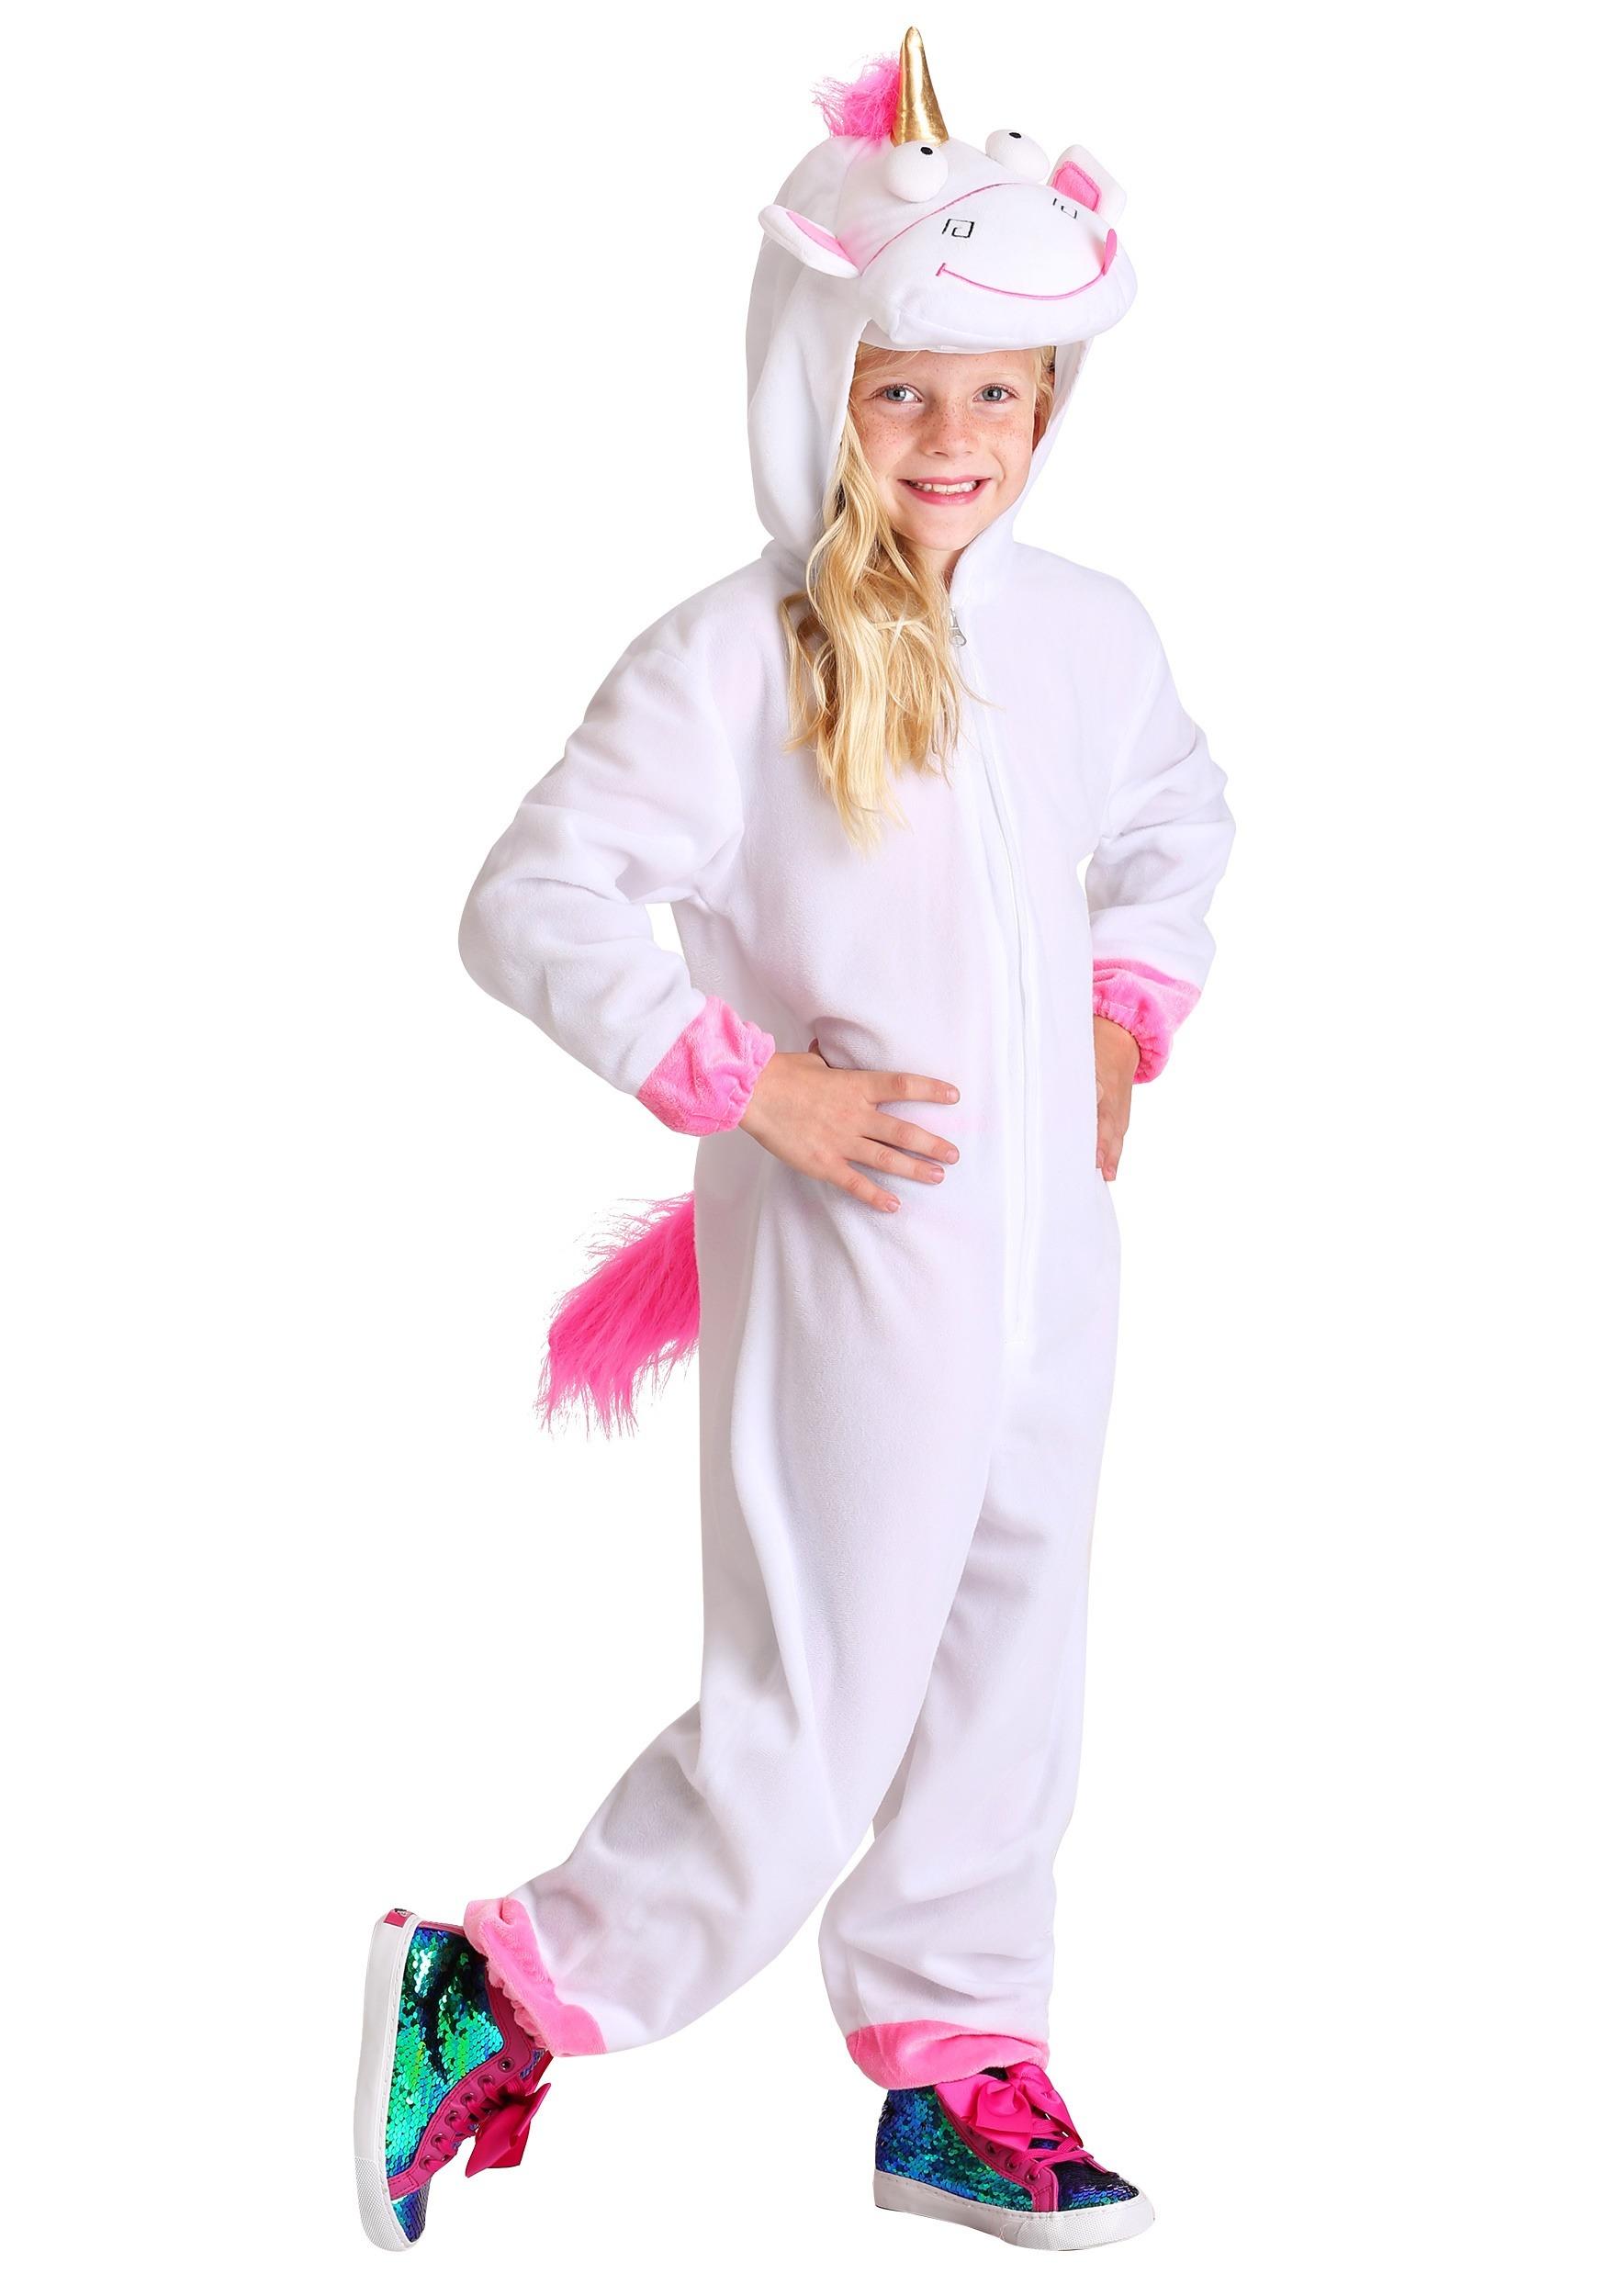 Minions Fluffy Unicorn Costume For Girls